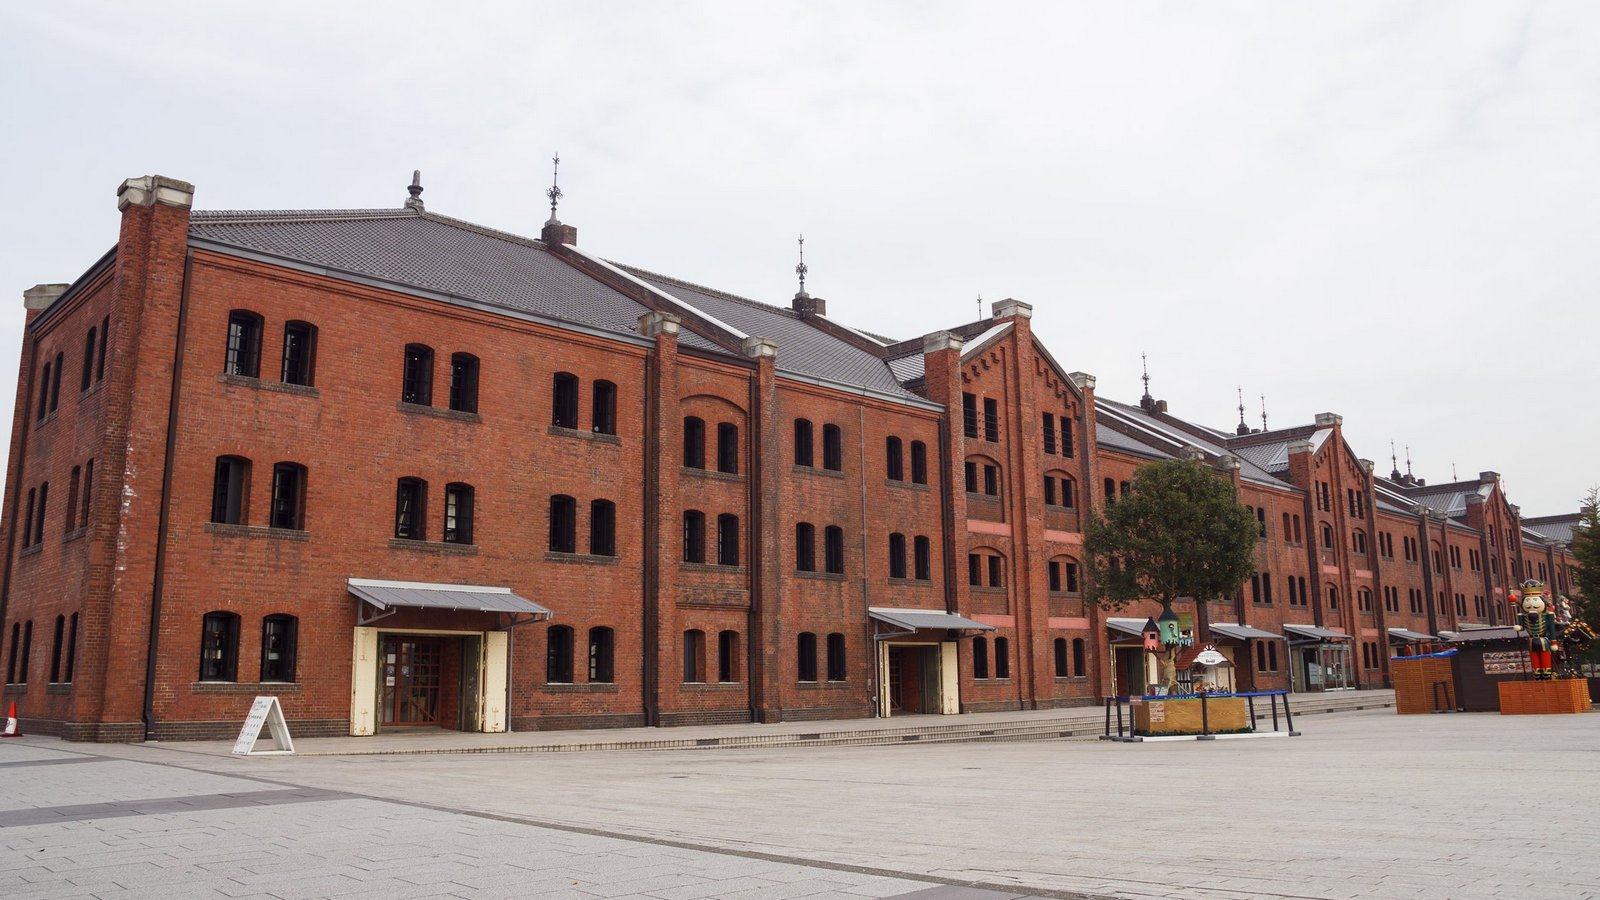 【橫濱景點】紅磚 赤レンガ 倉庫 》現代港口中的優美古蹟 1